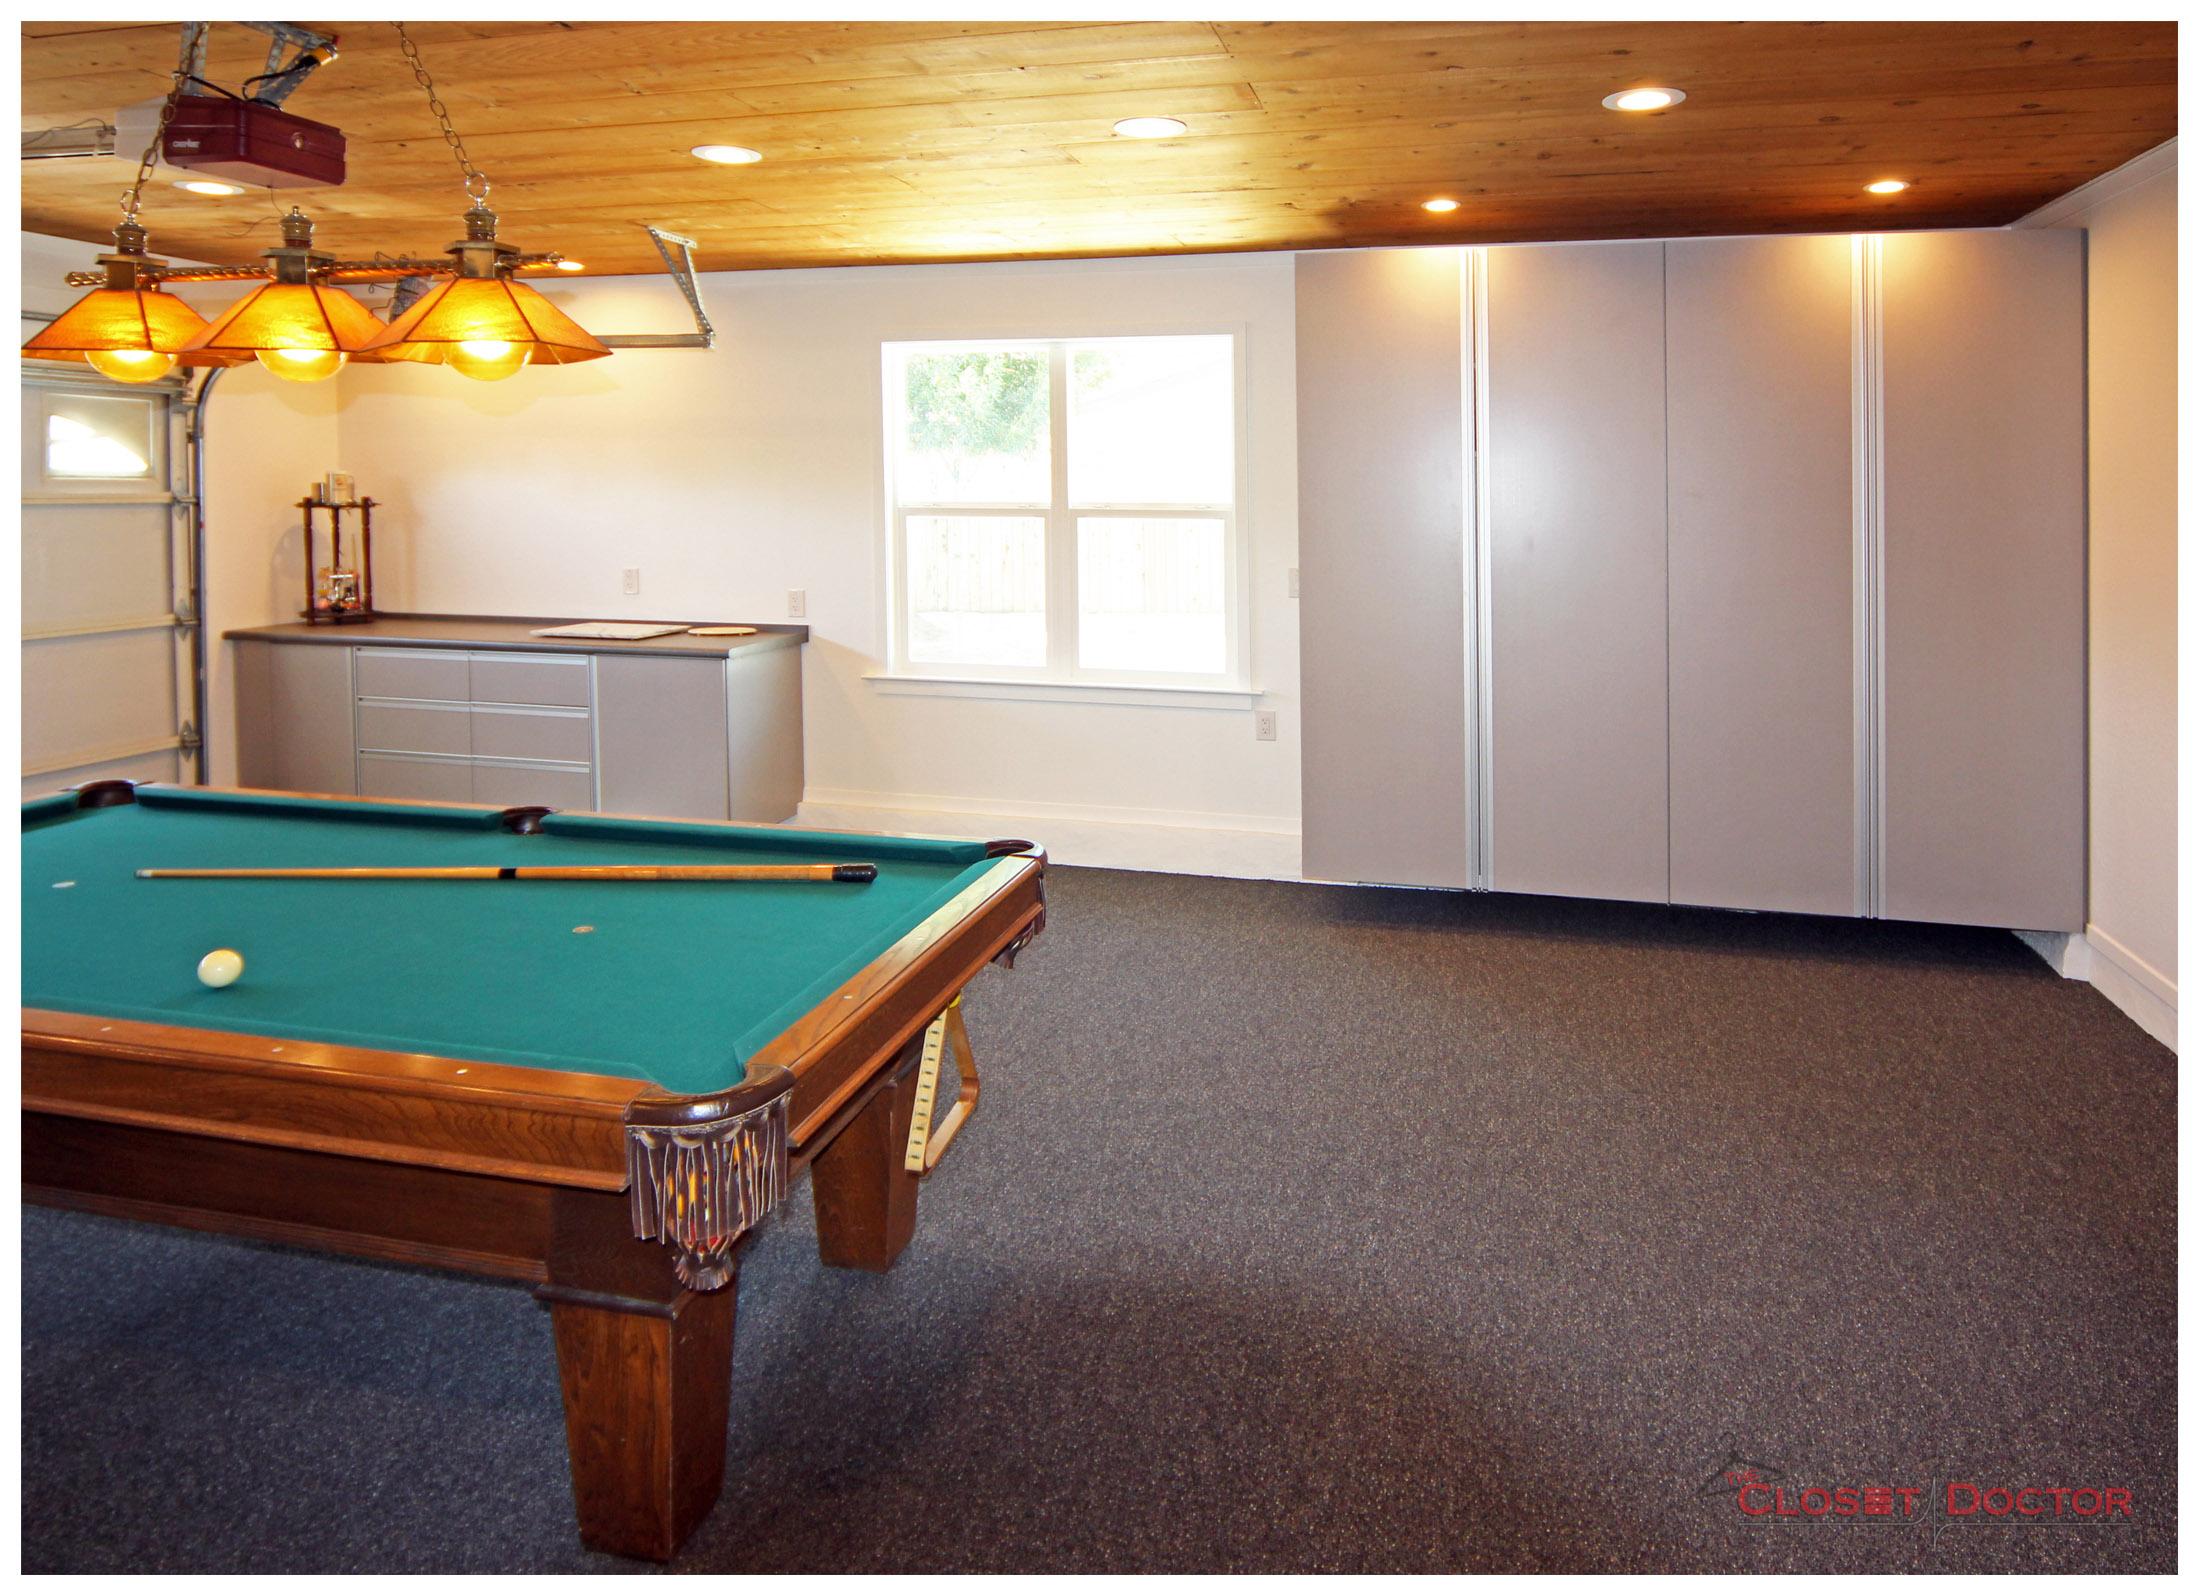 17-custom-garage-cabinets-the-closet-doctor-lincoln-roseville-sacramento-Hillier.jpg